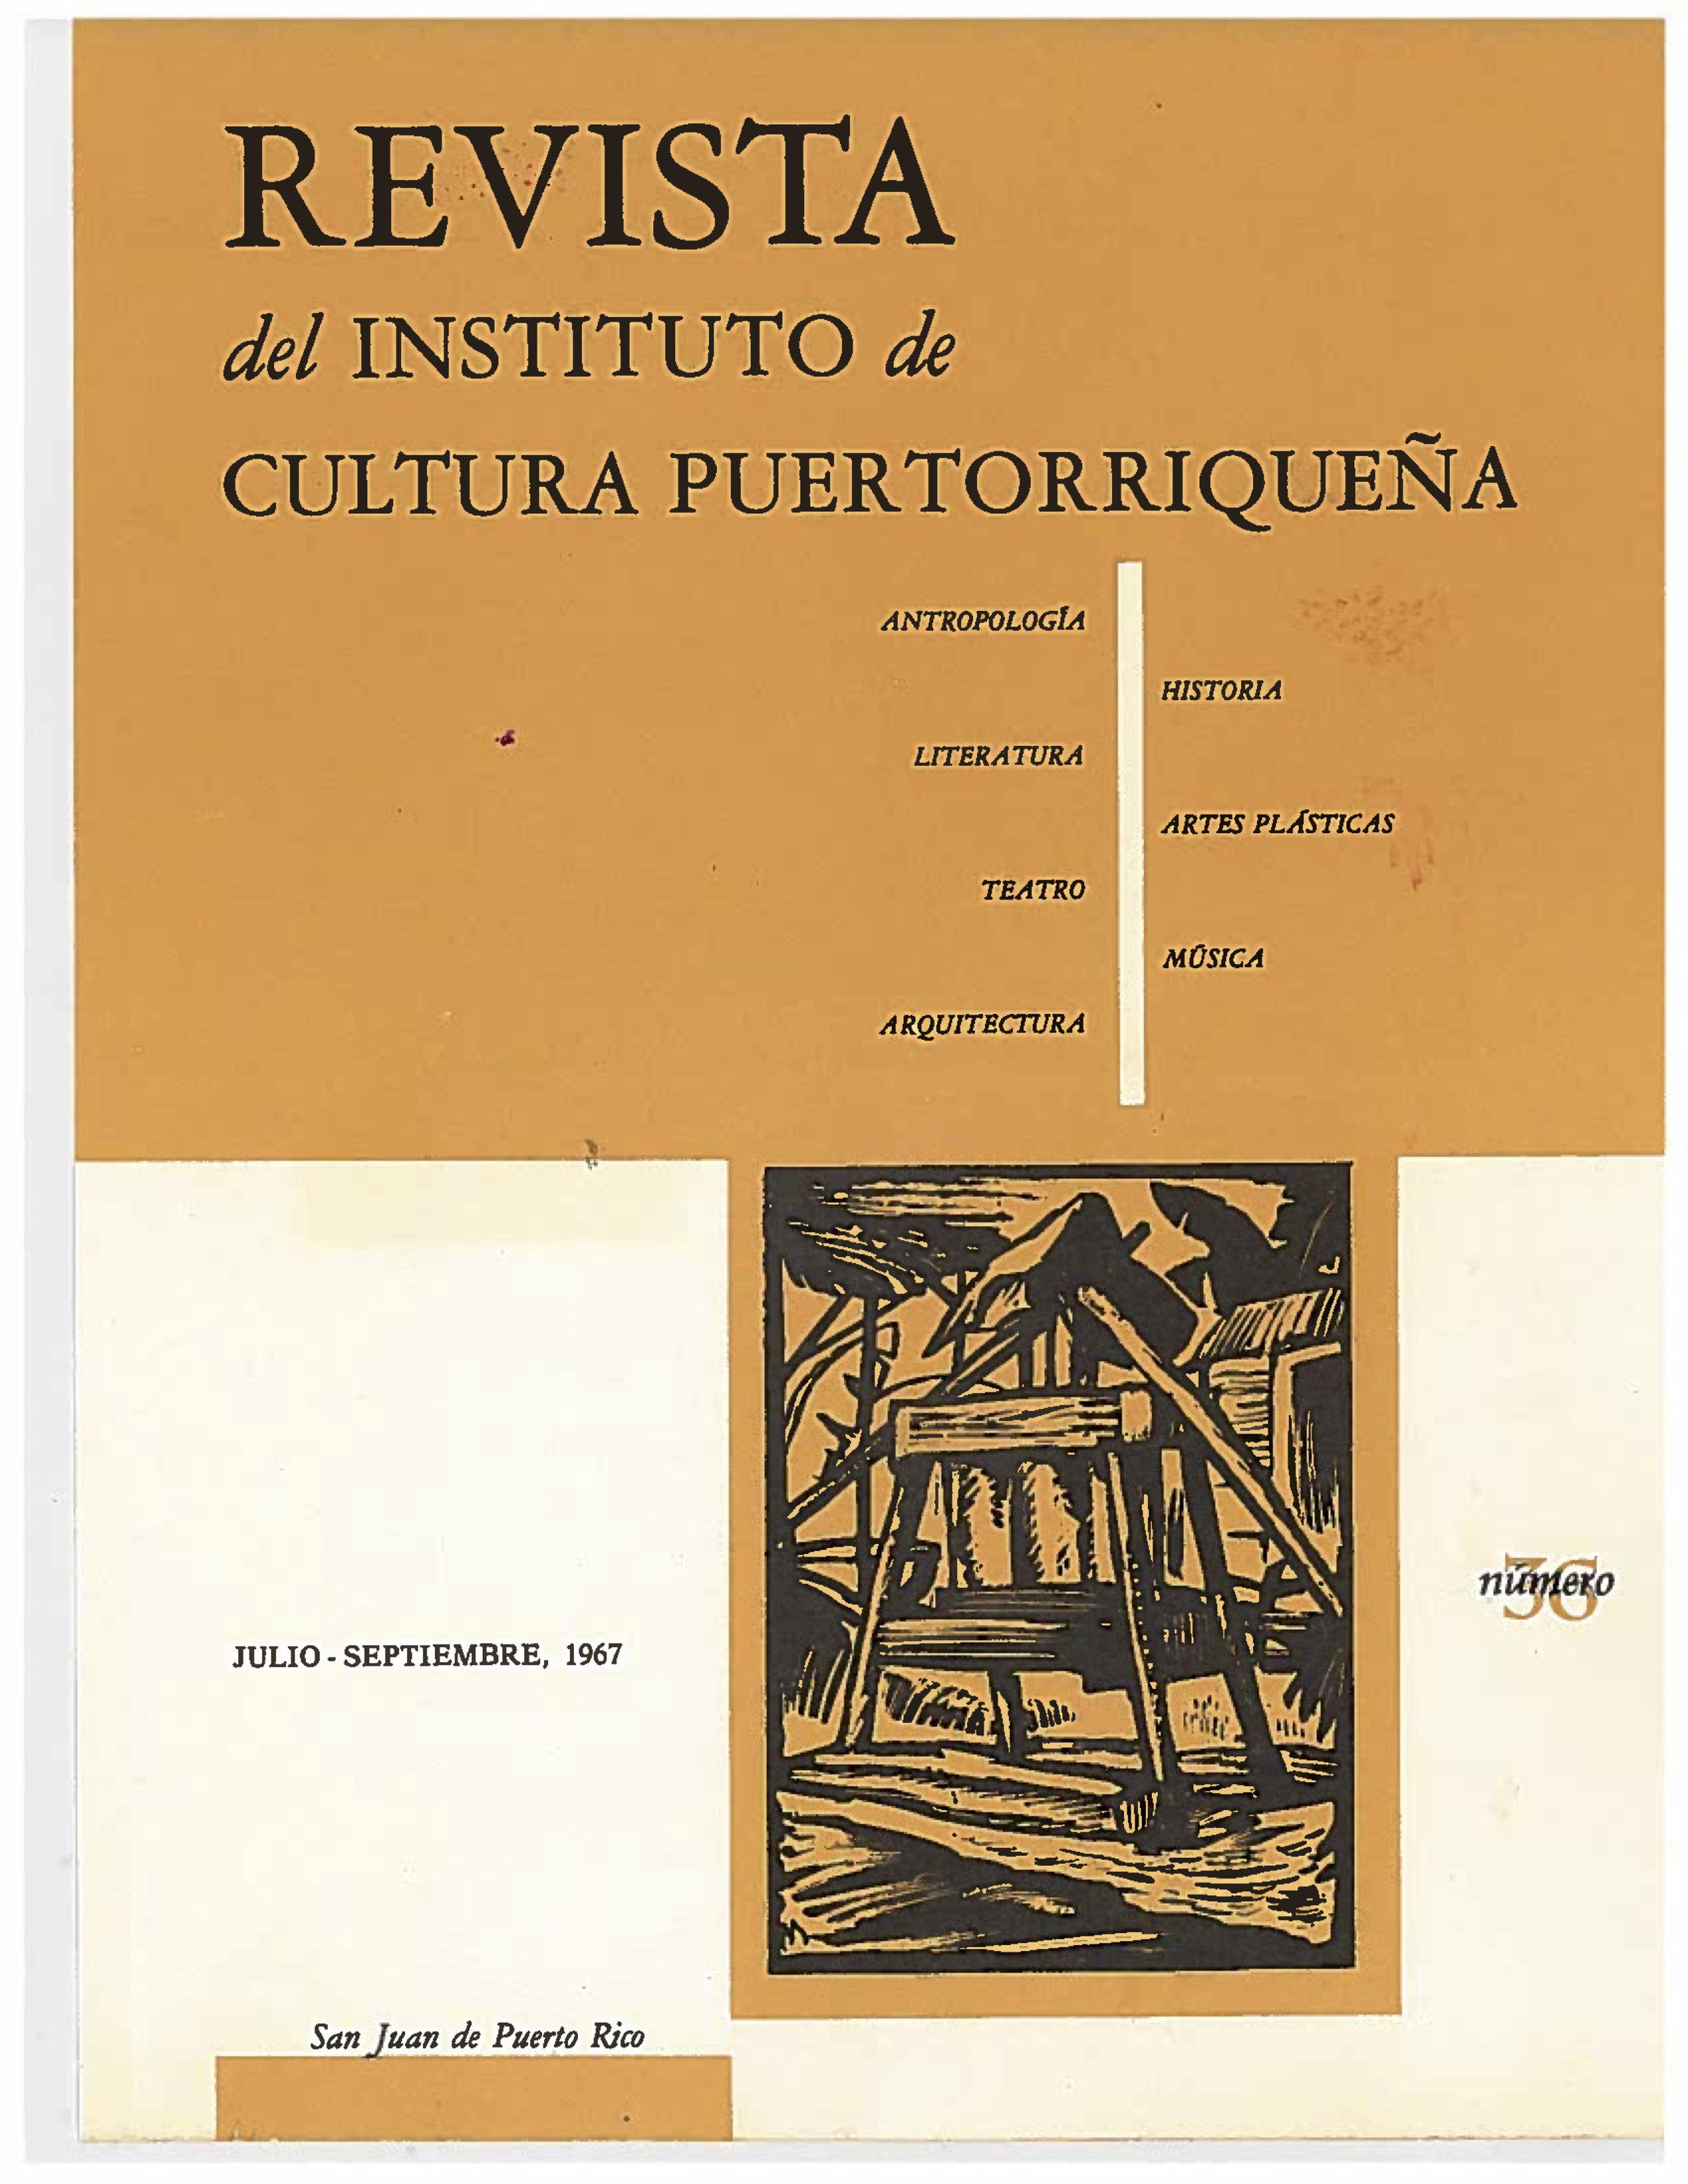 Número 36 / 1967